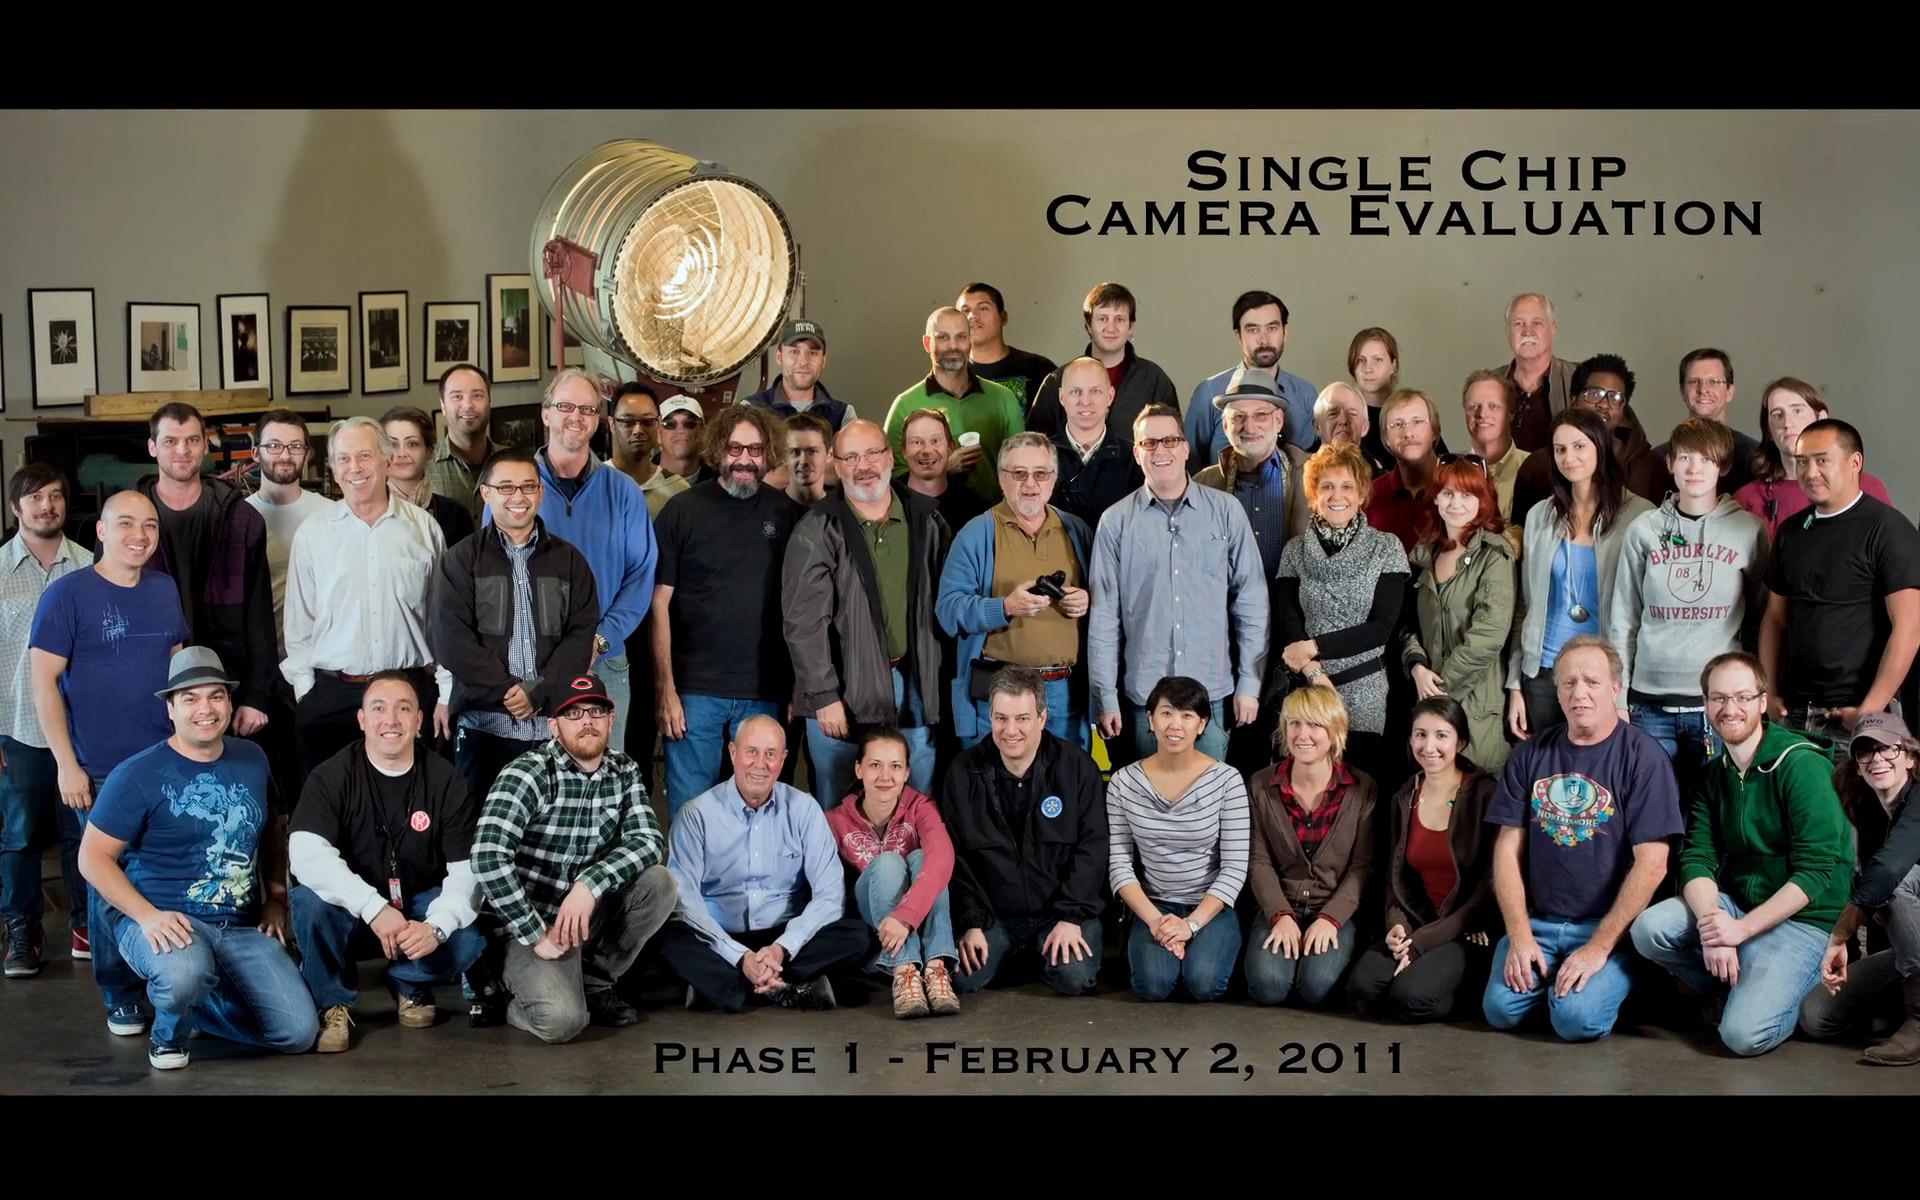 Zacuto Single Chip Camera Evaluation - scce